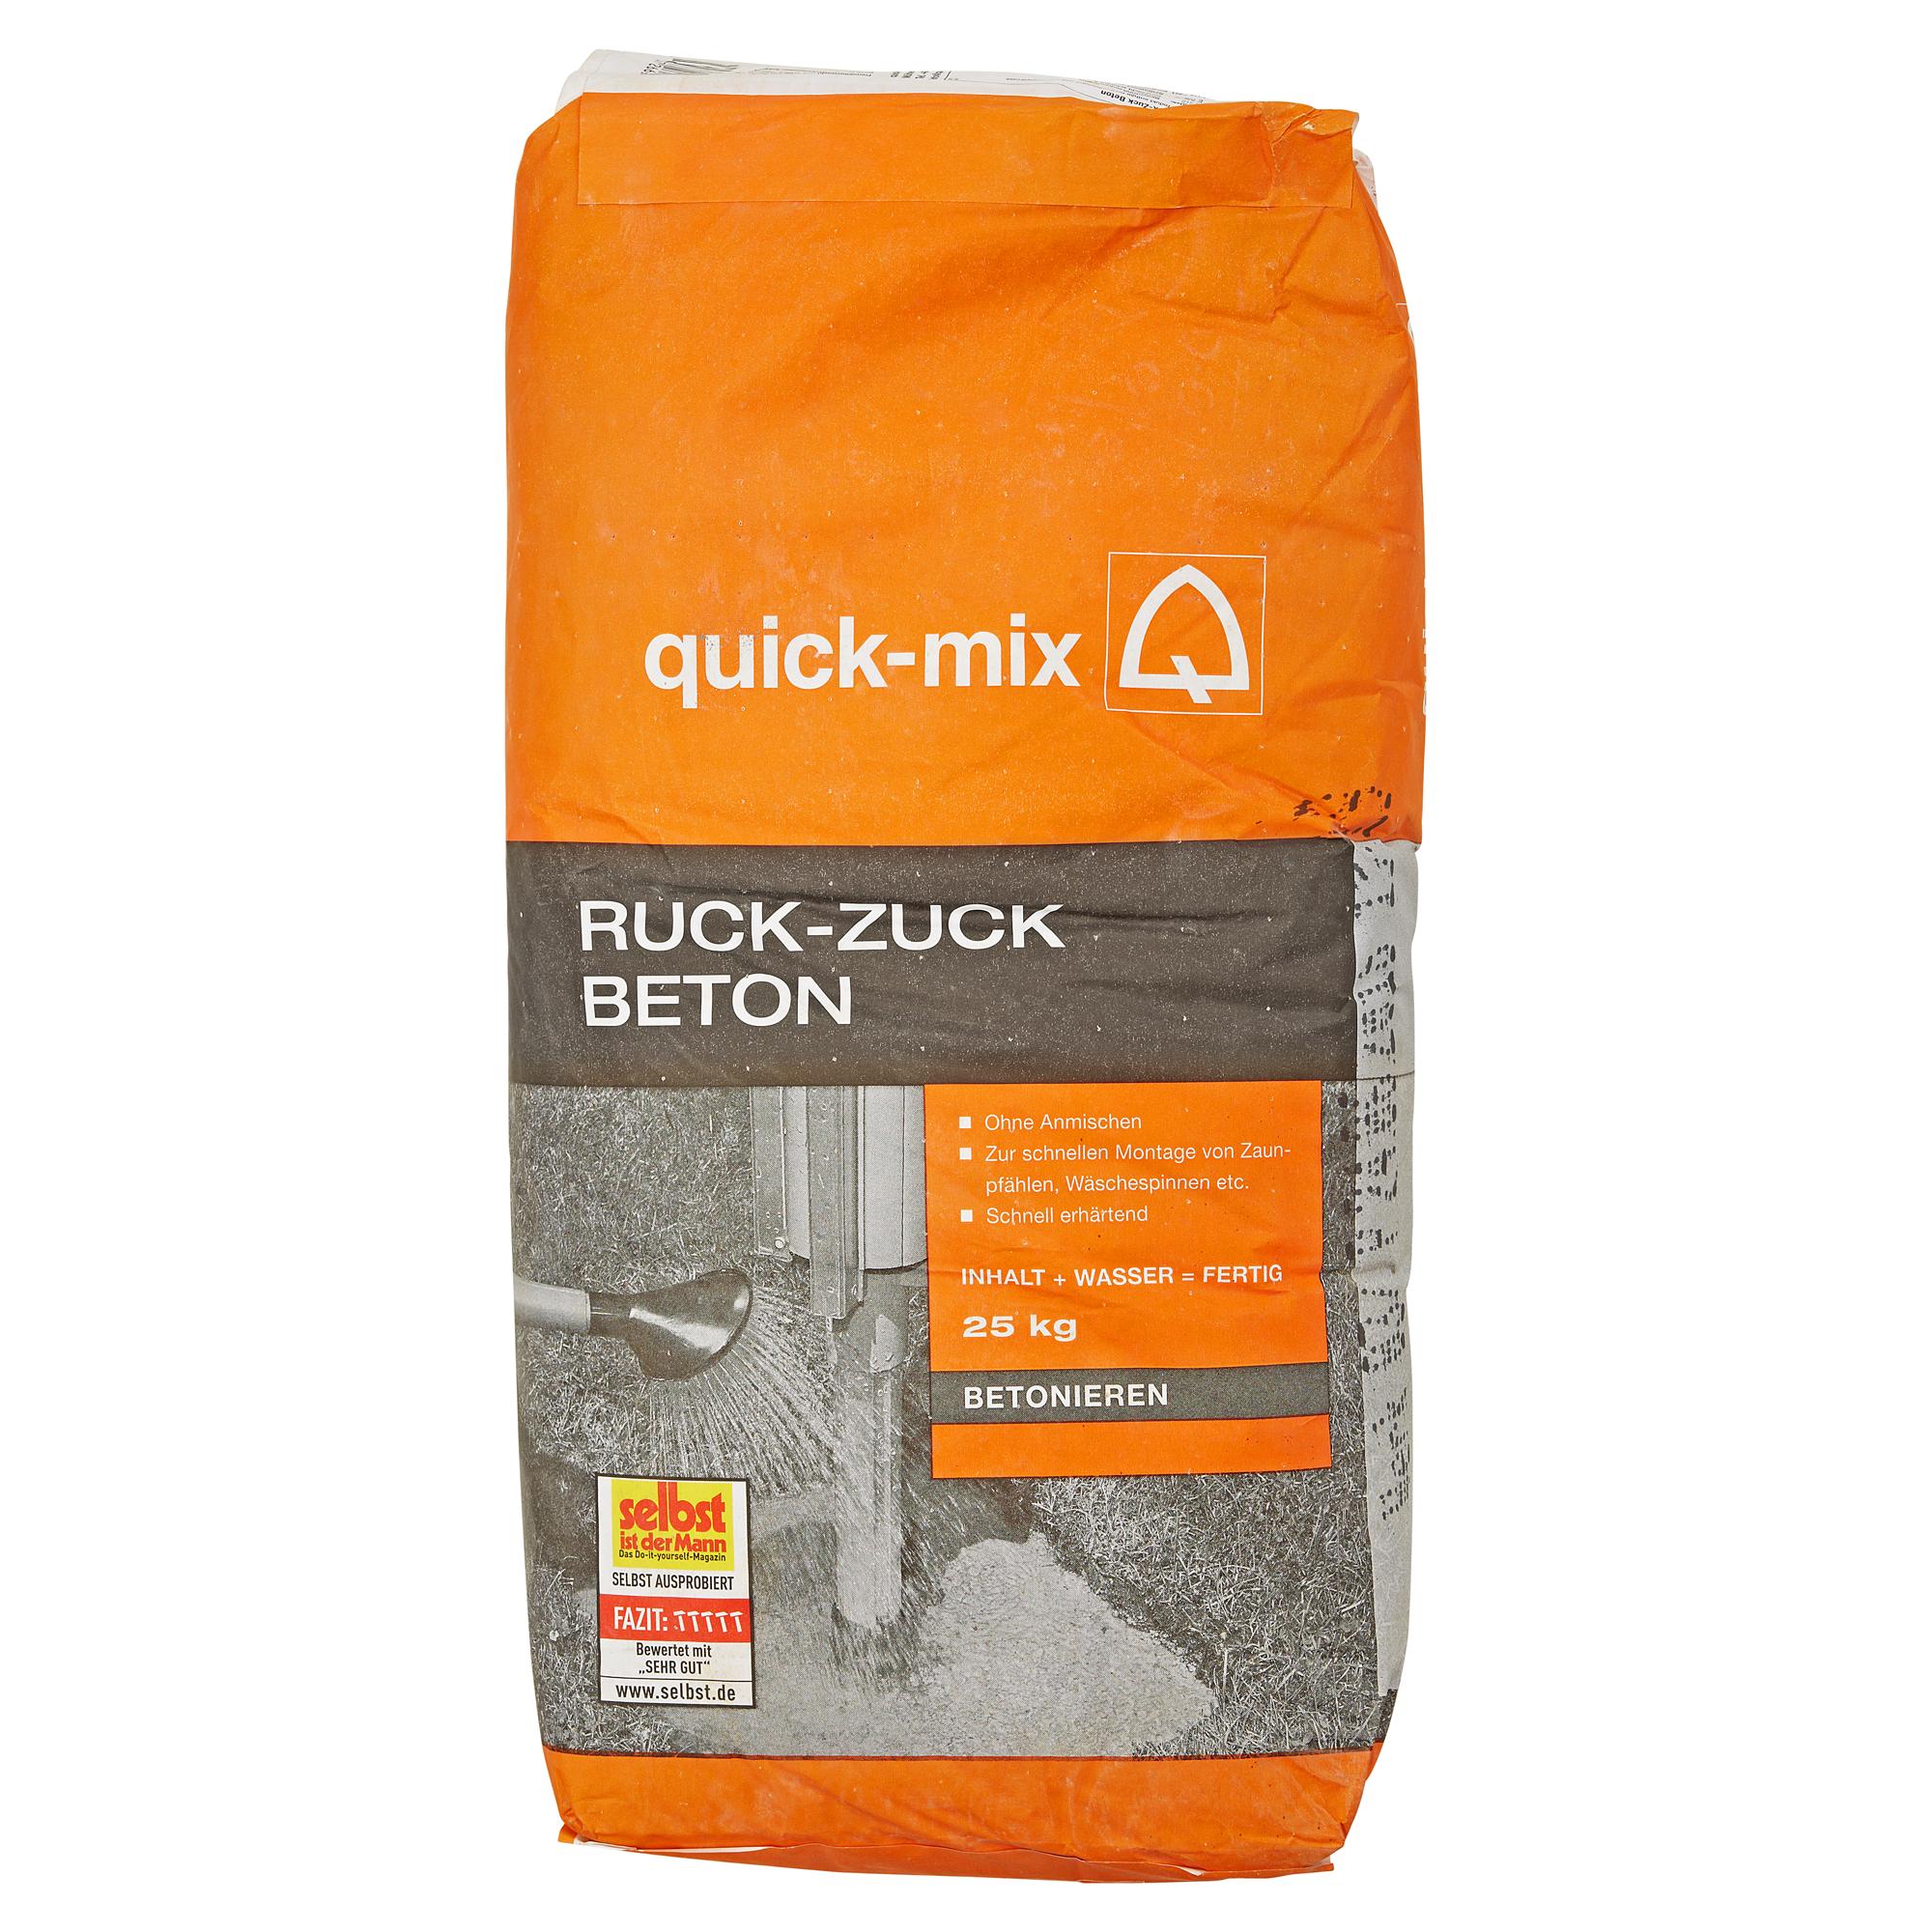 quick mix ruck zuck beton toom baumarkt